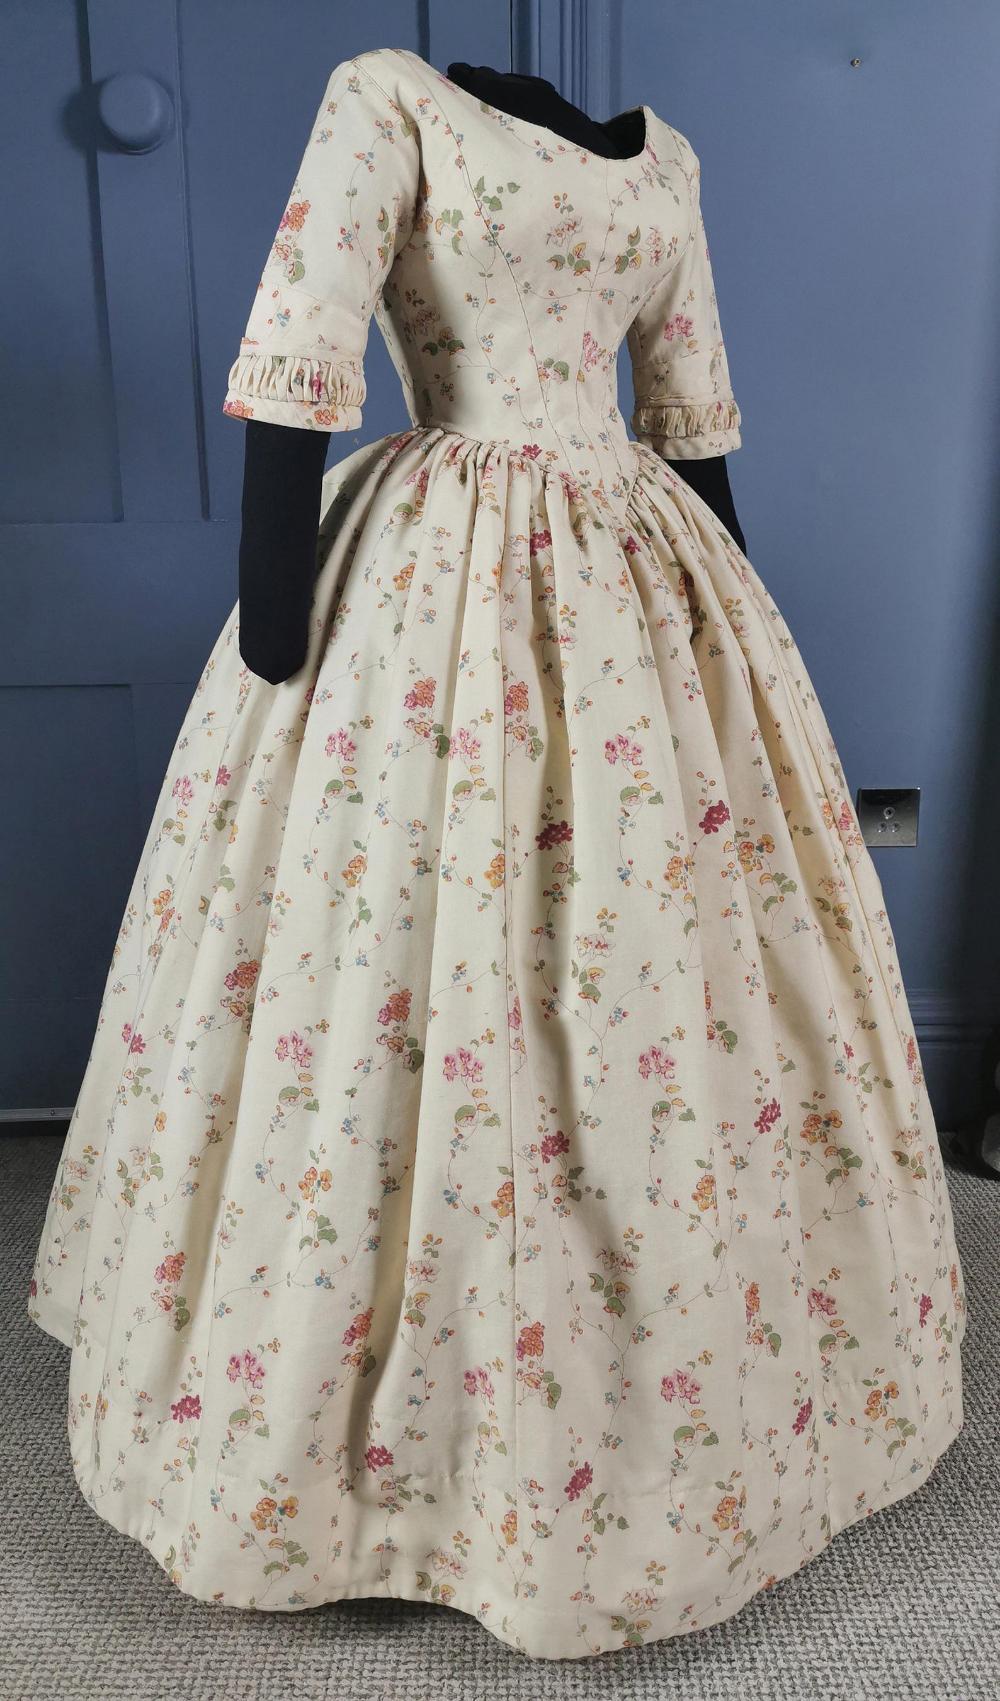 Almost Pristine 1840s Floral Print Dress Victorian Antique Fashion Historical Dresses Victorian Dress Fashion [ 1701 x 1000 Pixel ]